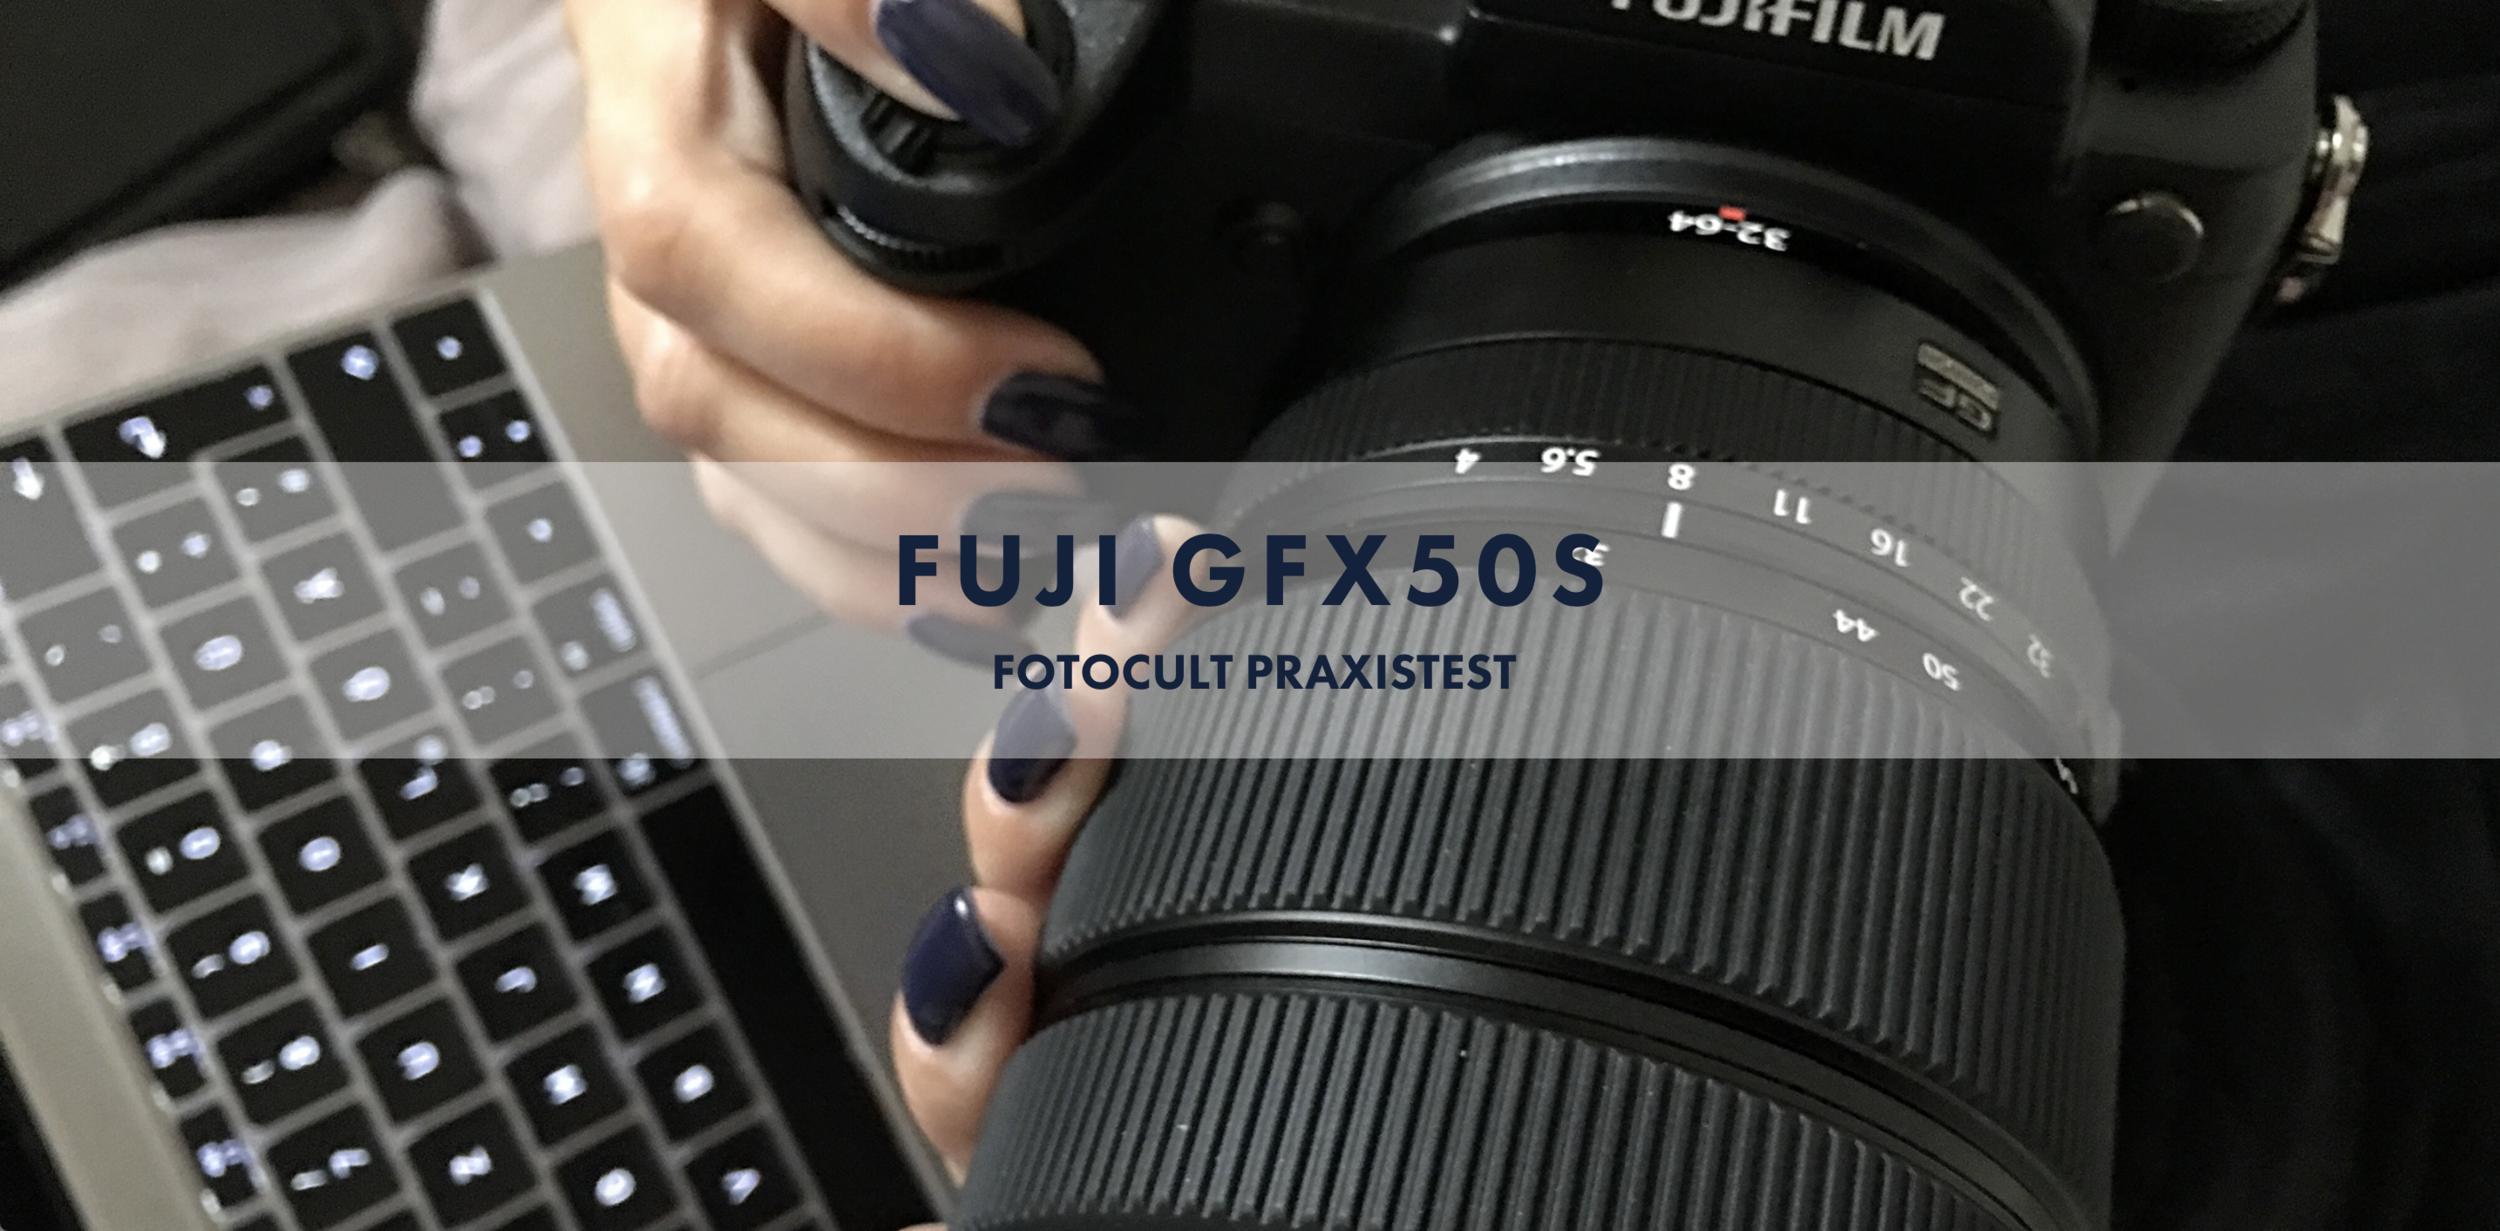 FUJI GFX 50S - Mirrorless Medium Format